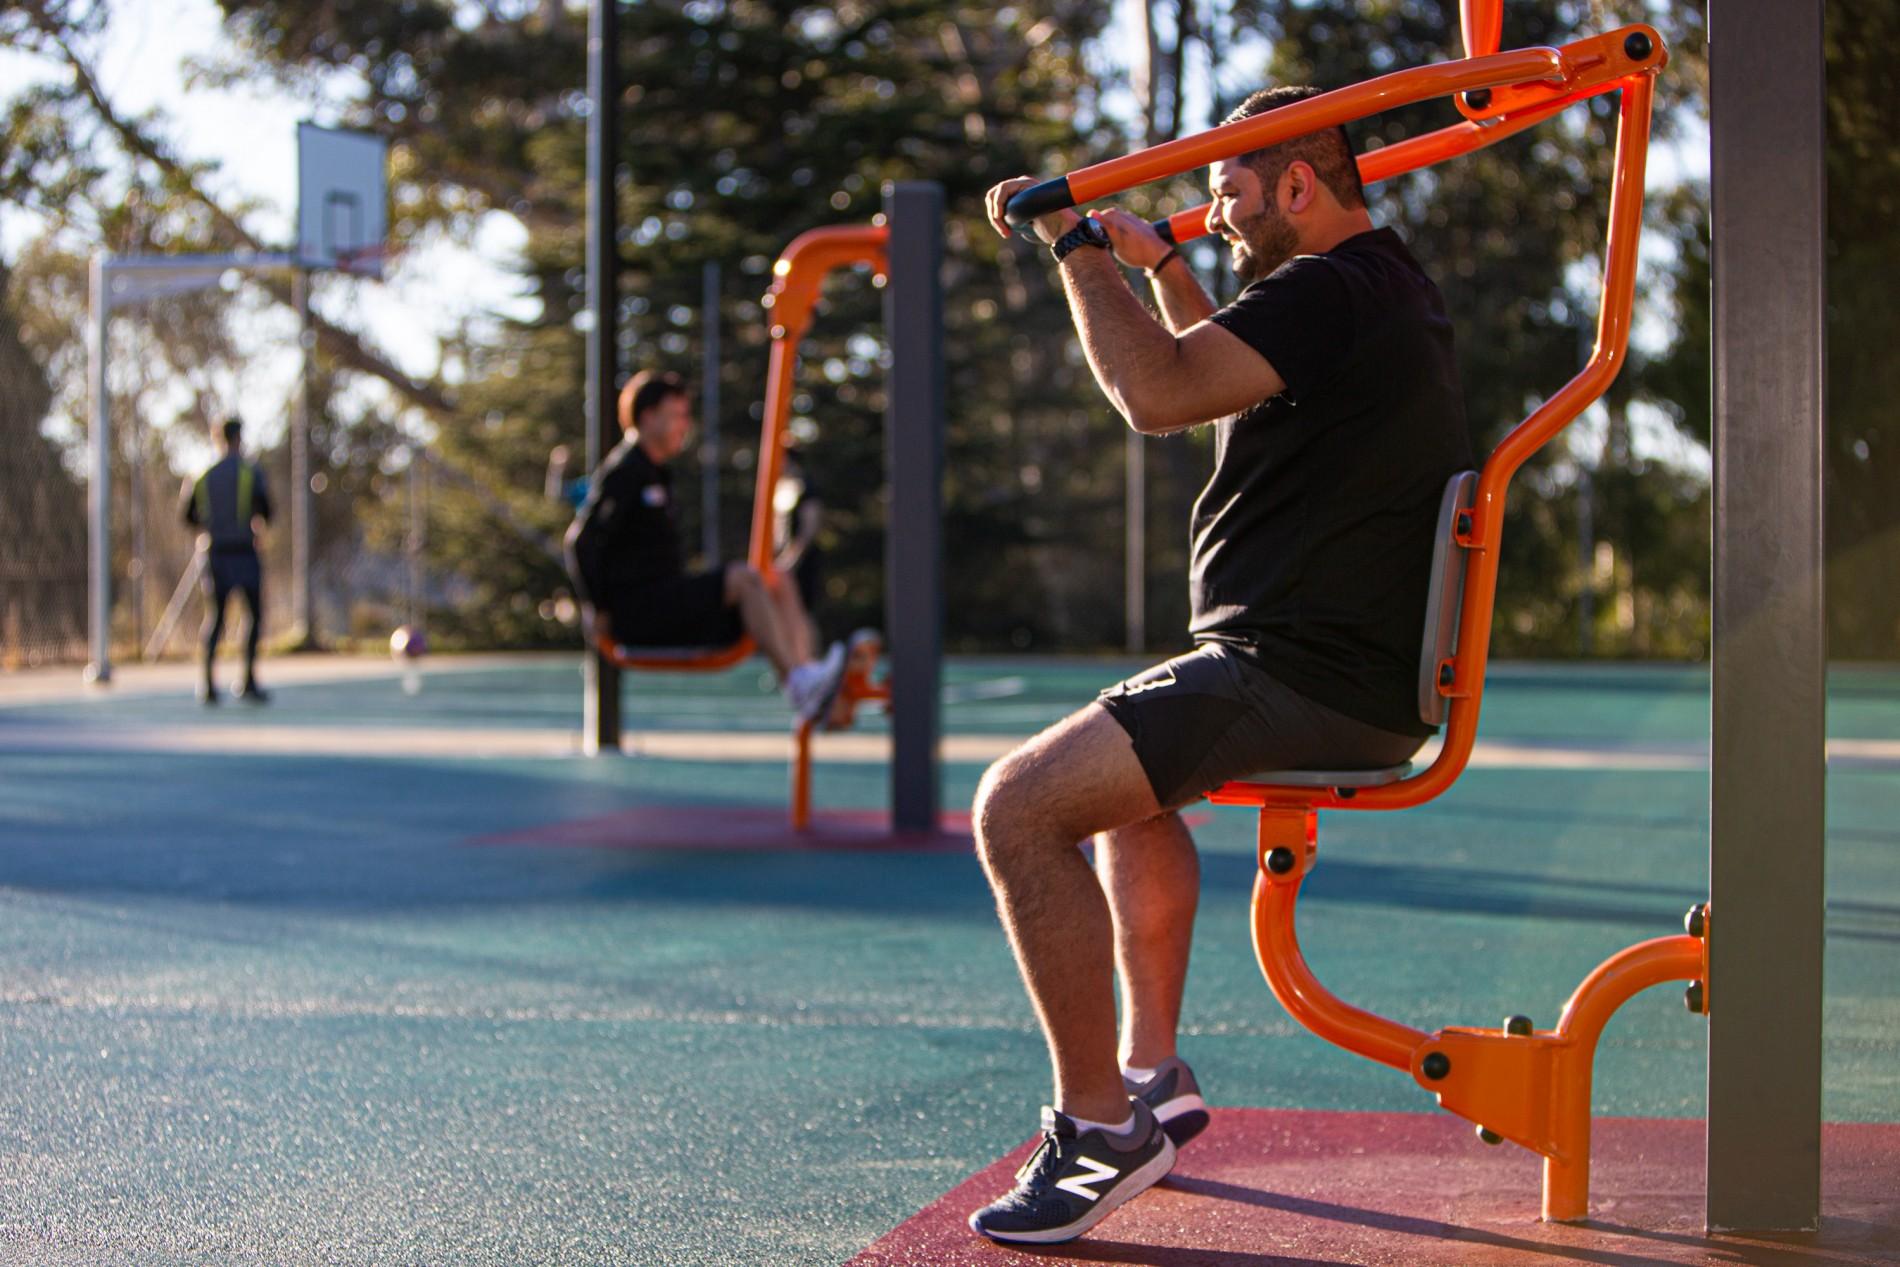 basketball-court-outdoor-gym